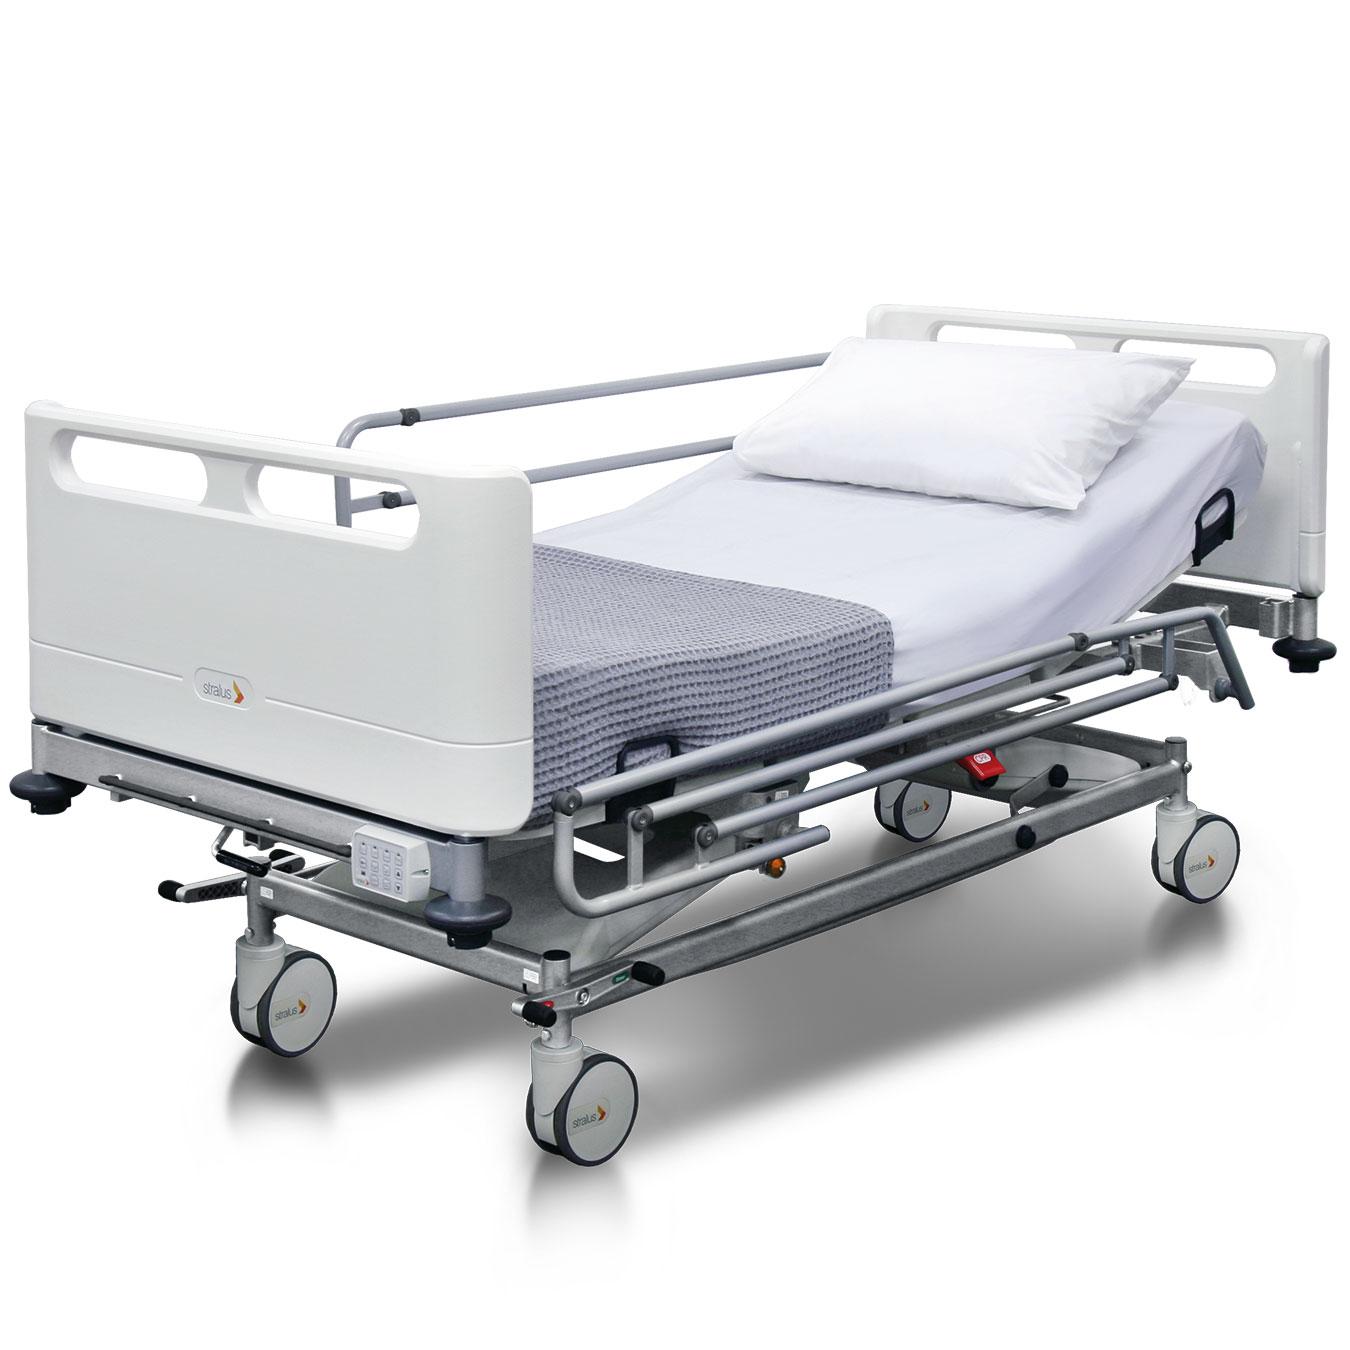 STRWARDC210-Stralus-C210-Acute-Care-Bed-Image-File-2a_v1